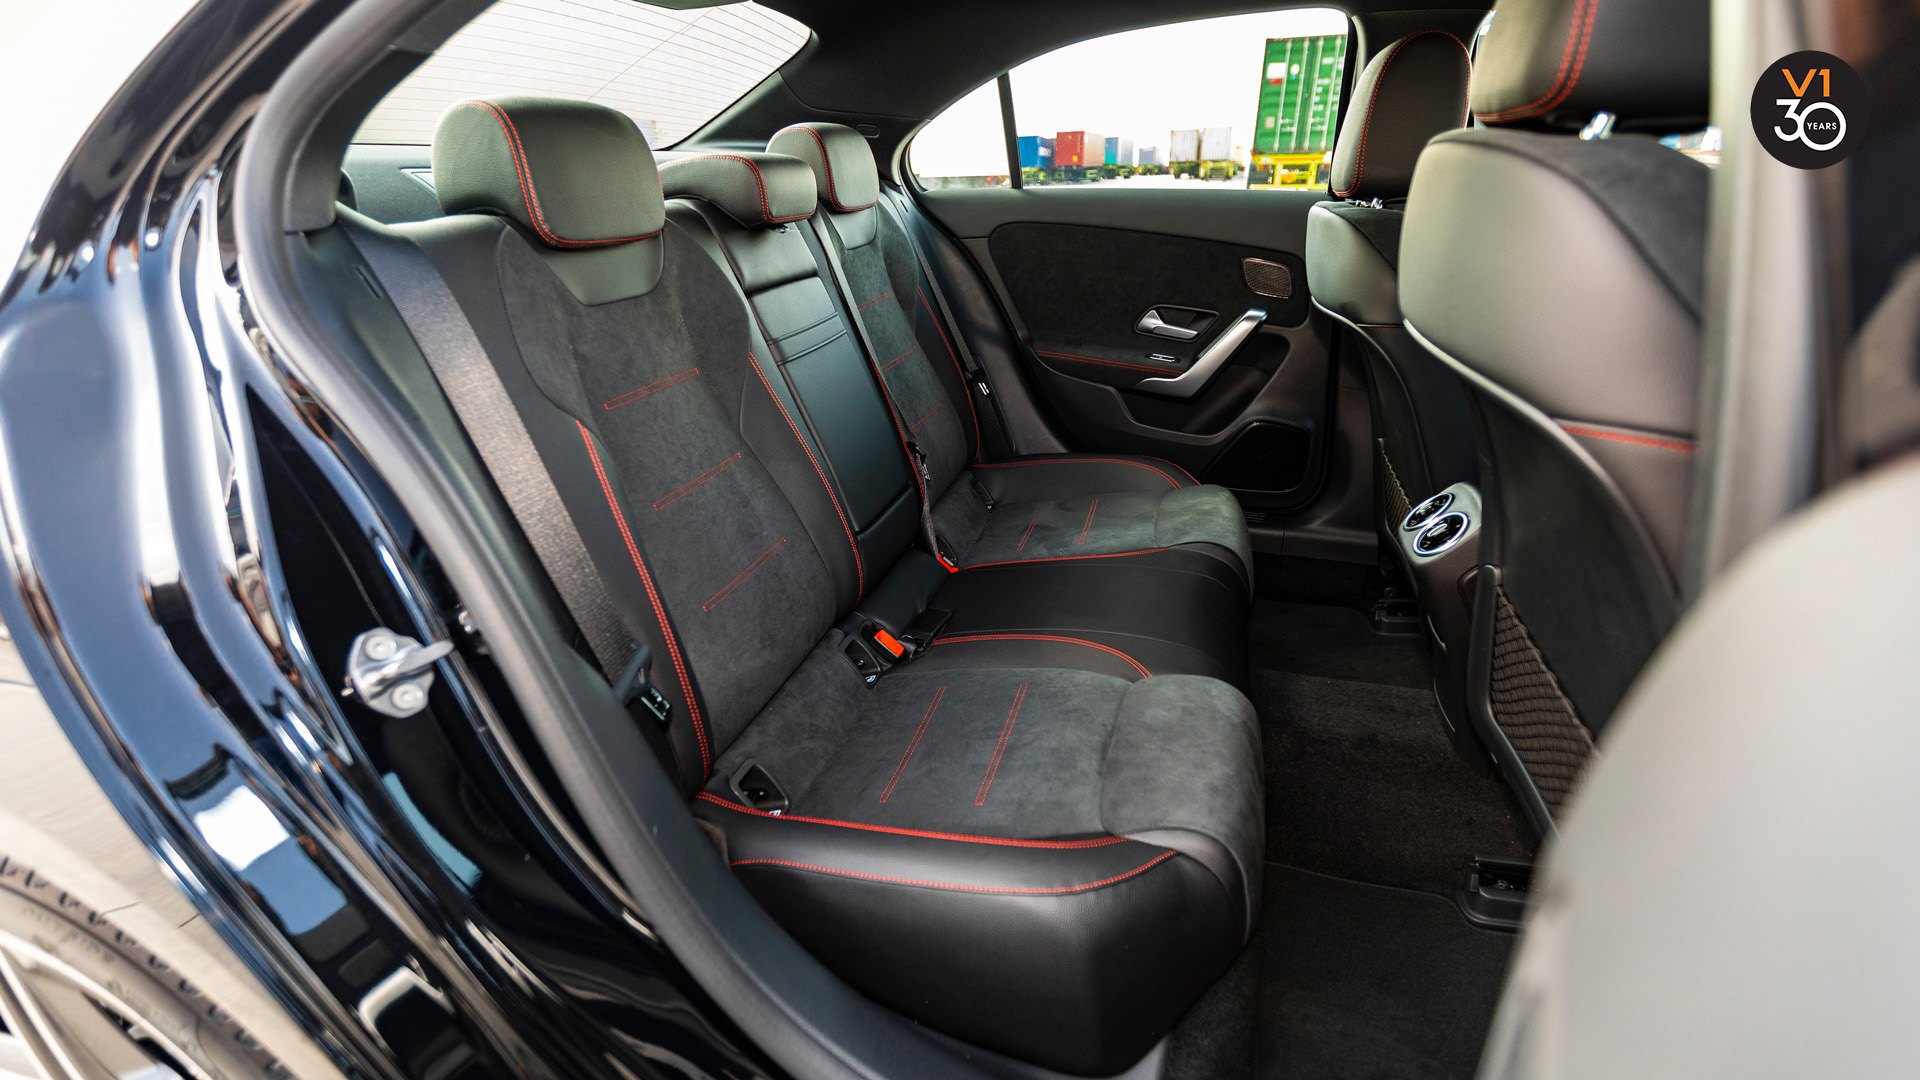 Mercedes-Benz A200 Saloon AMG Premium Plus - Passenger Seat